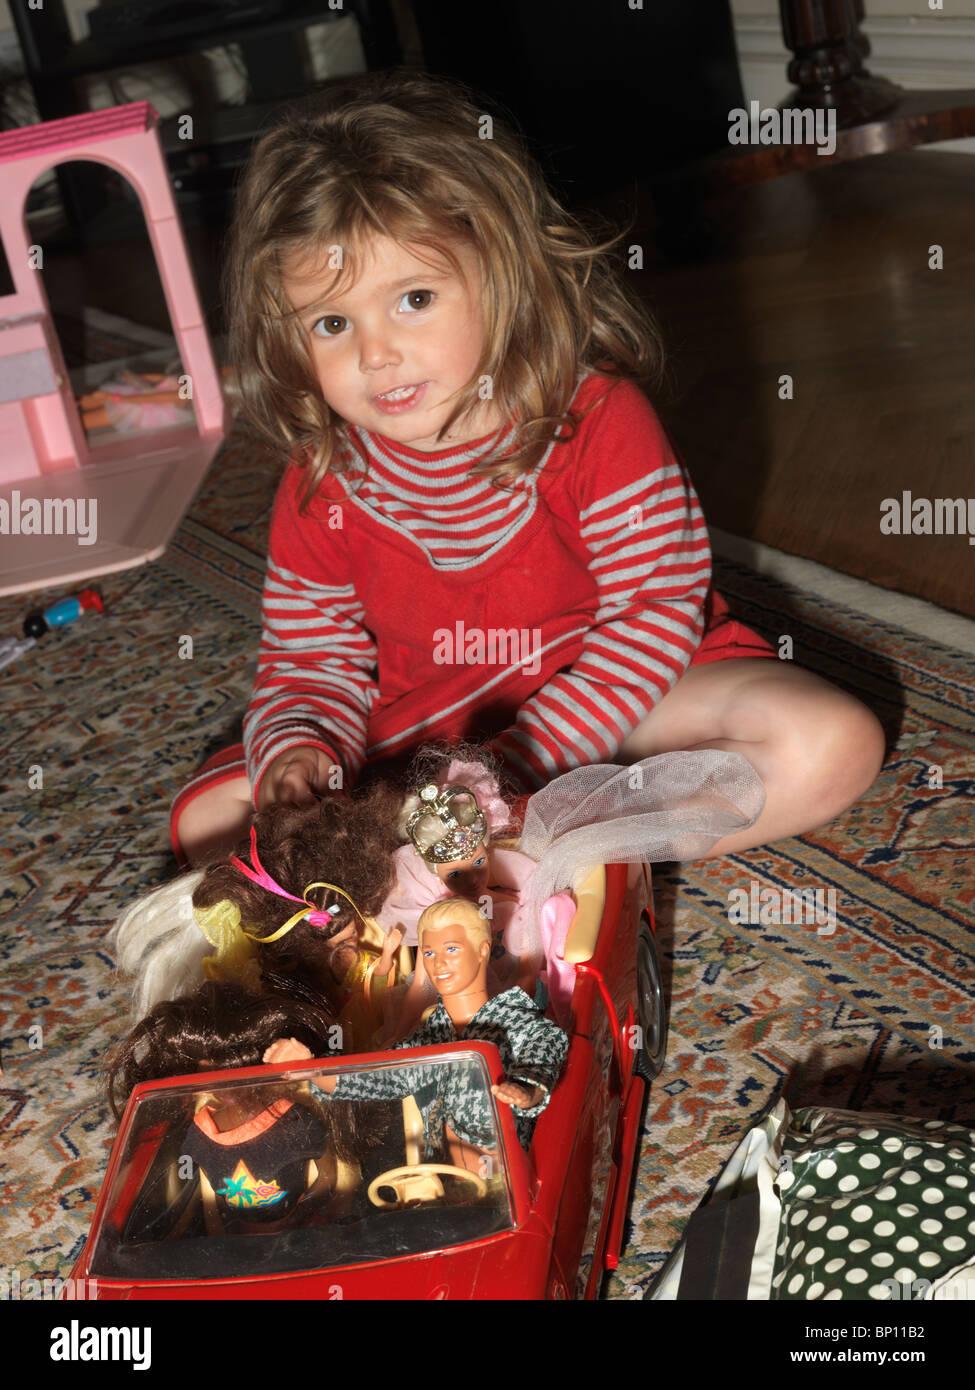 Barbie car stockfotos bilder alamy